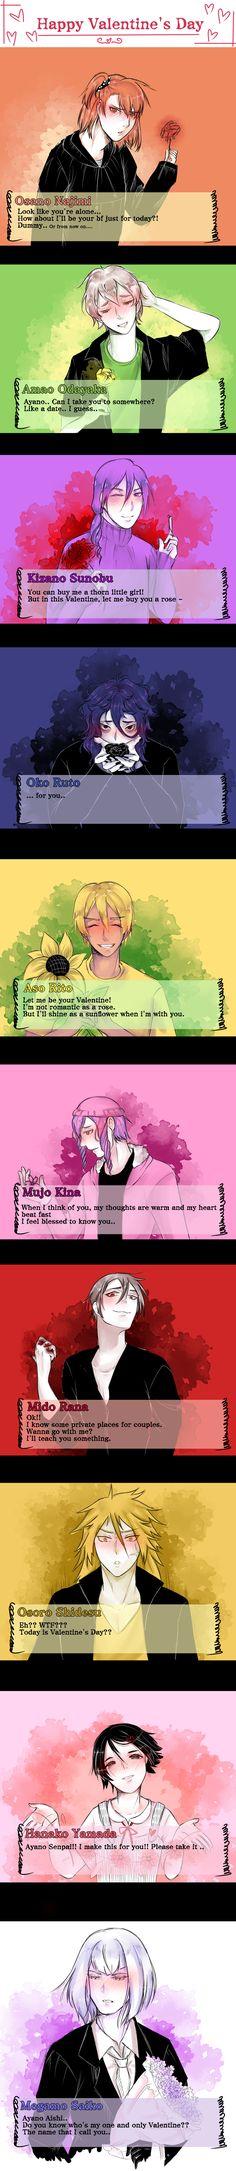 Happy Valentine's Day by violetleegee on DeviantArt Yandere Manga, Yandere Boy, Animes Yandere, Anime Chibi, Anime Meme, Yandere Simulator Characters, Yandere Simulator Memes, Yendere Simulator, Ayano X Budo